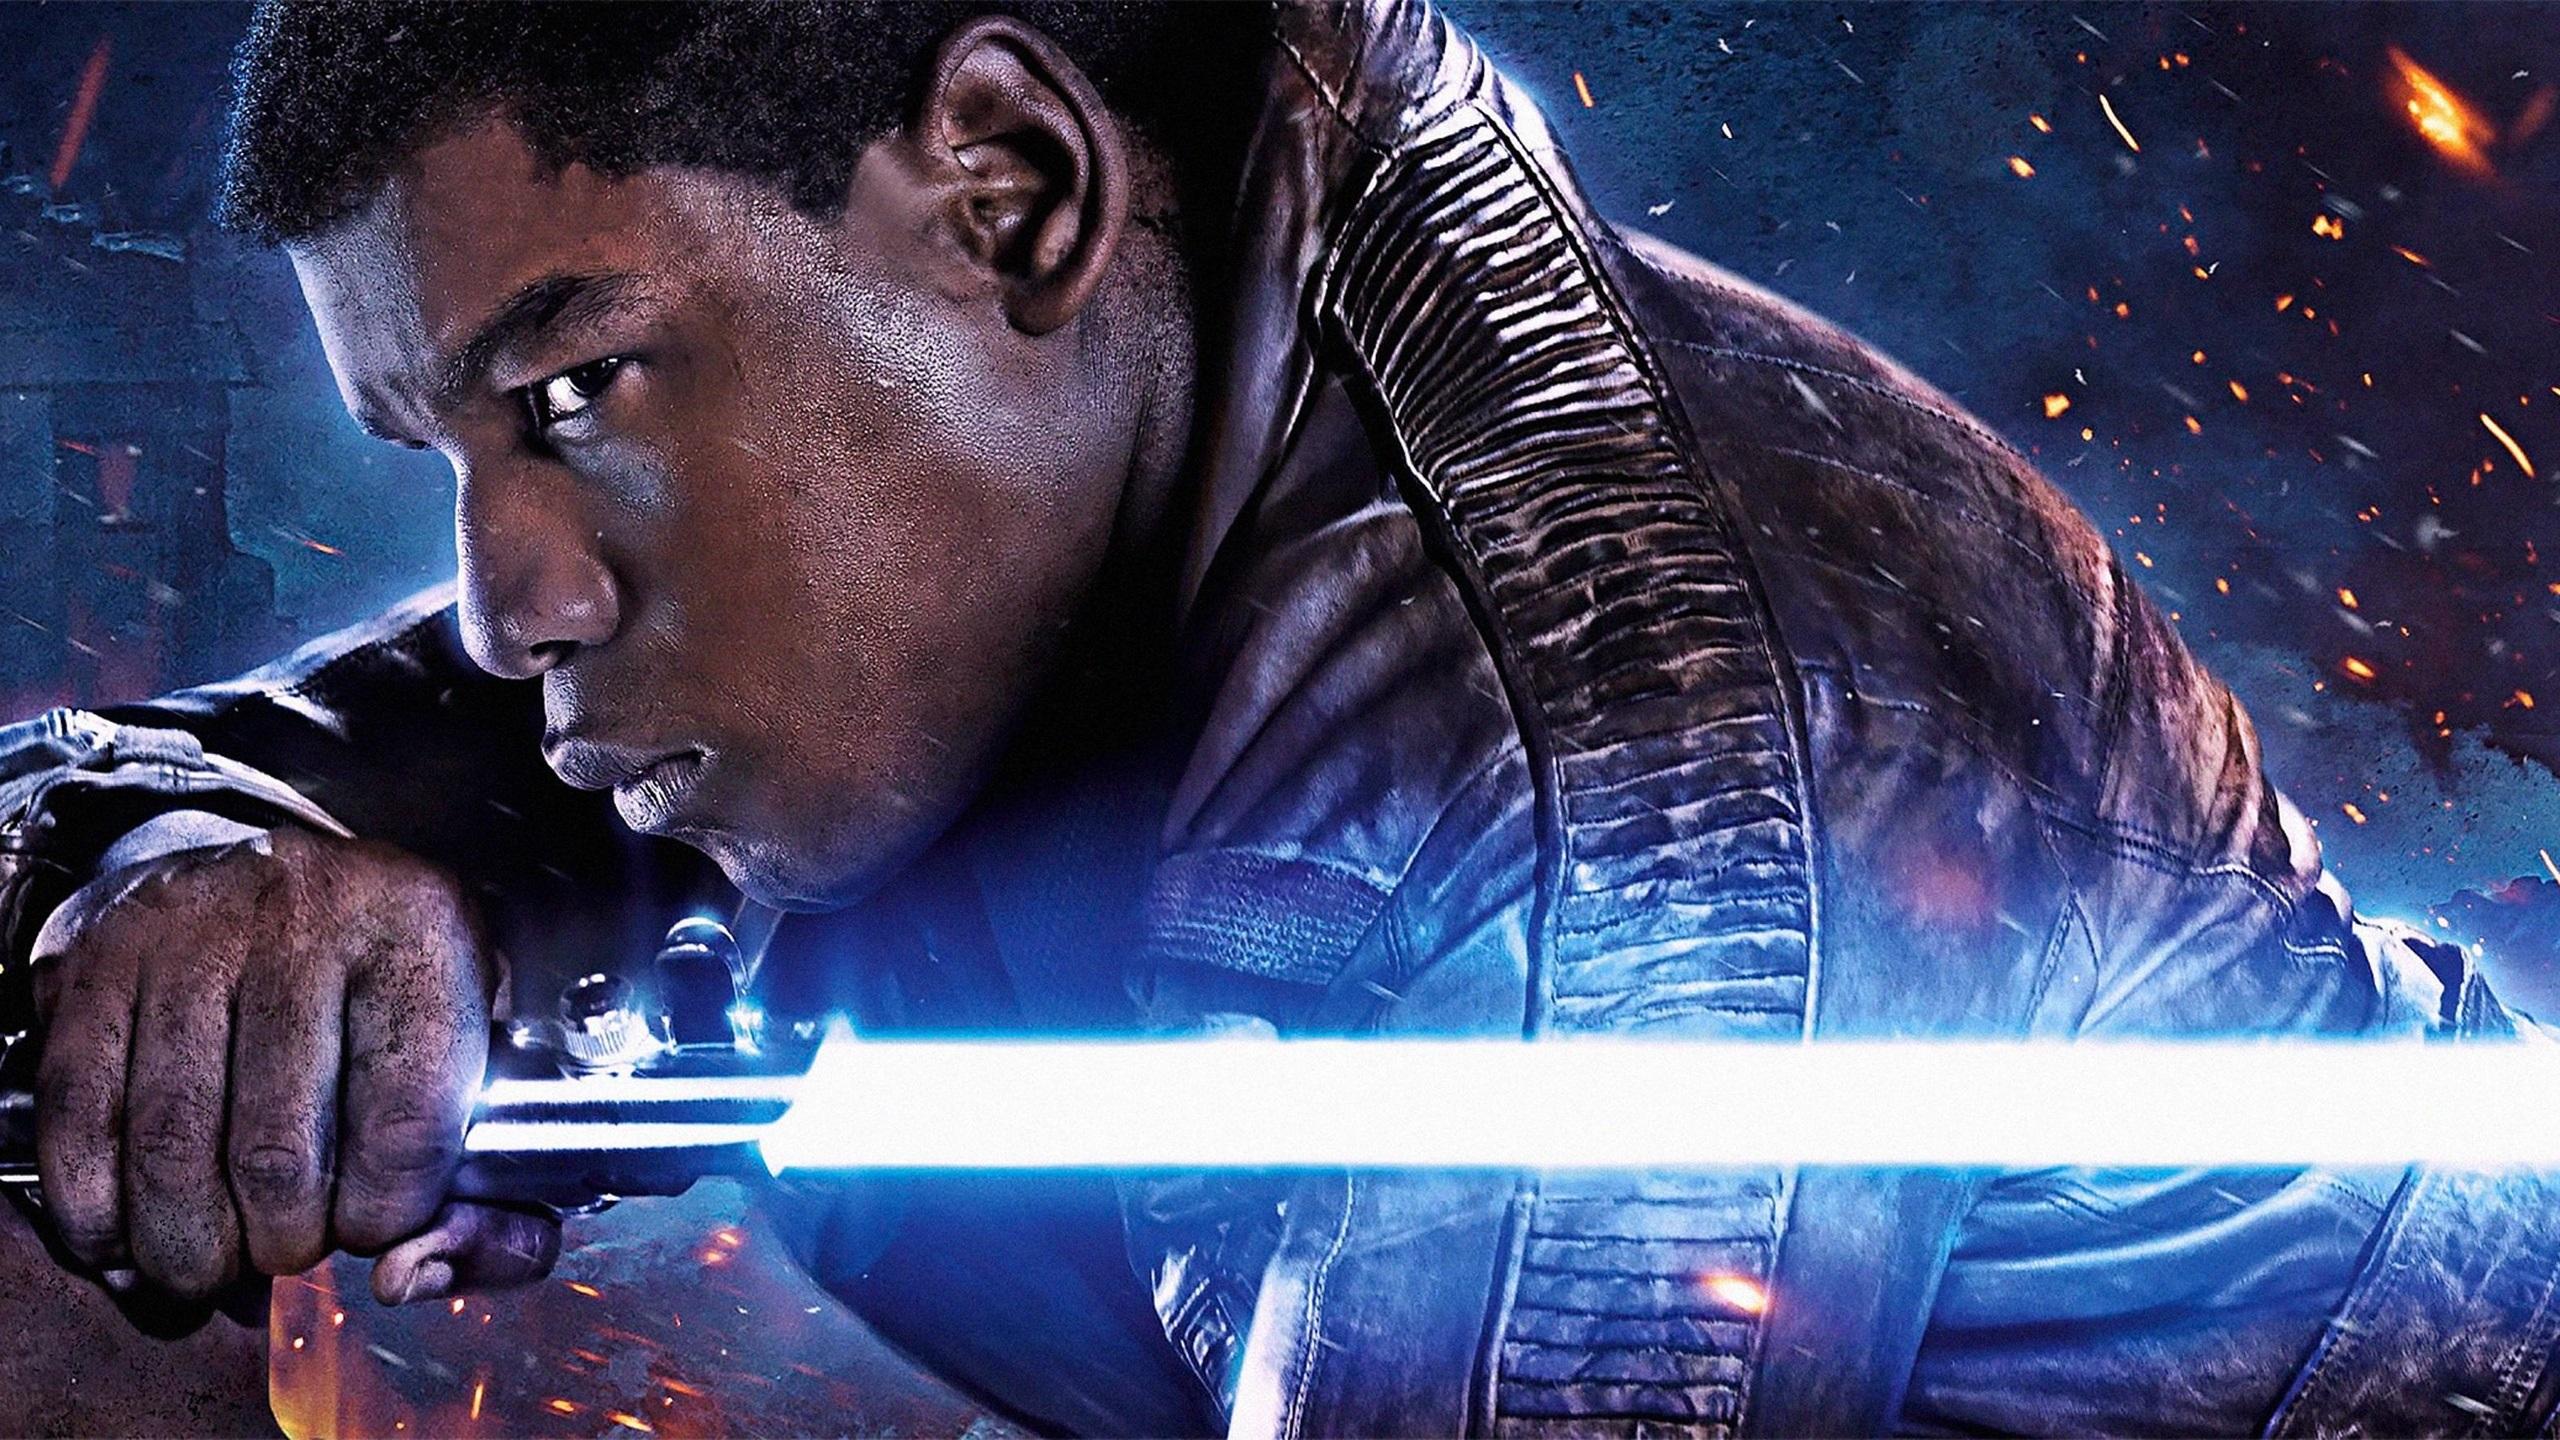 Wallpaper John Boyega Star Wars Episode Vii The Force